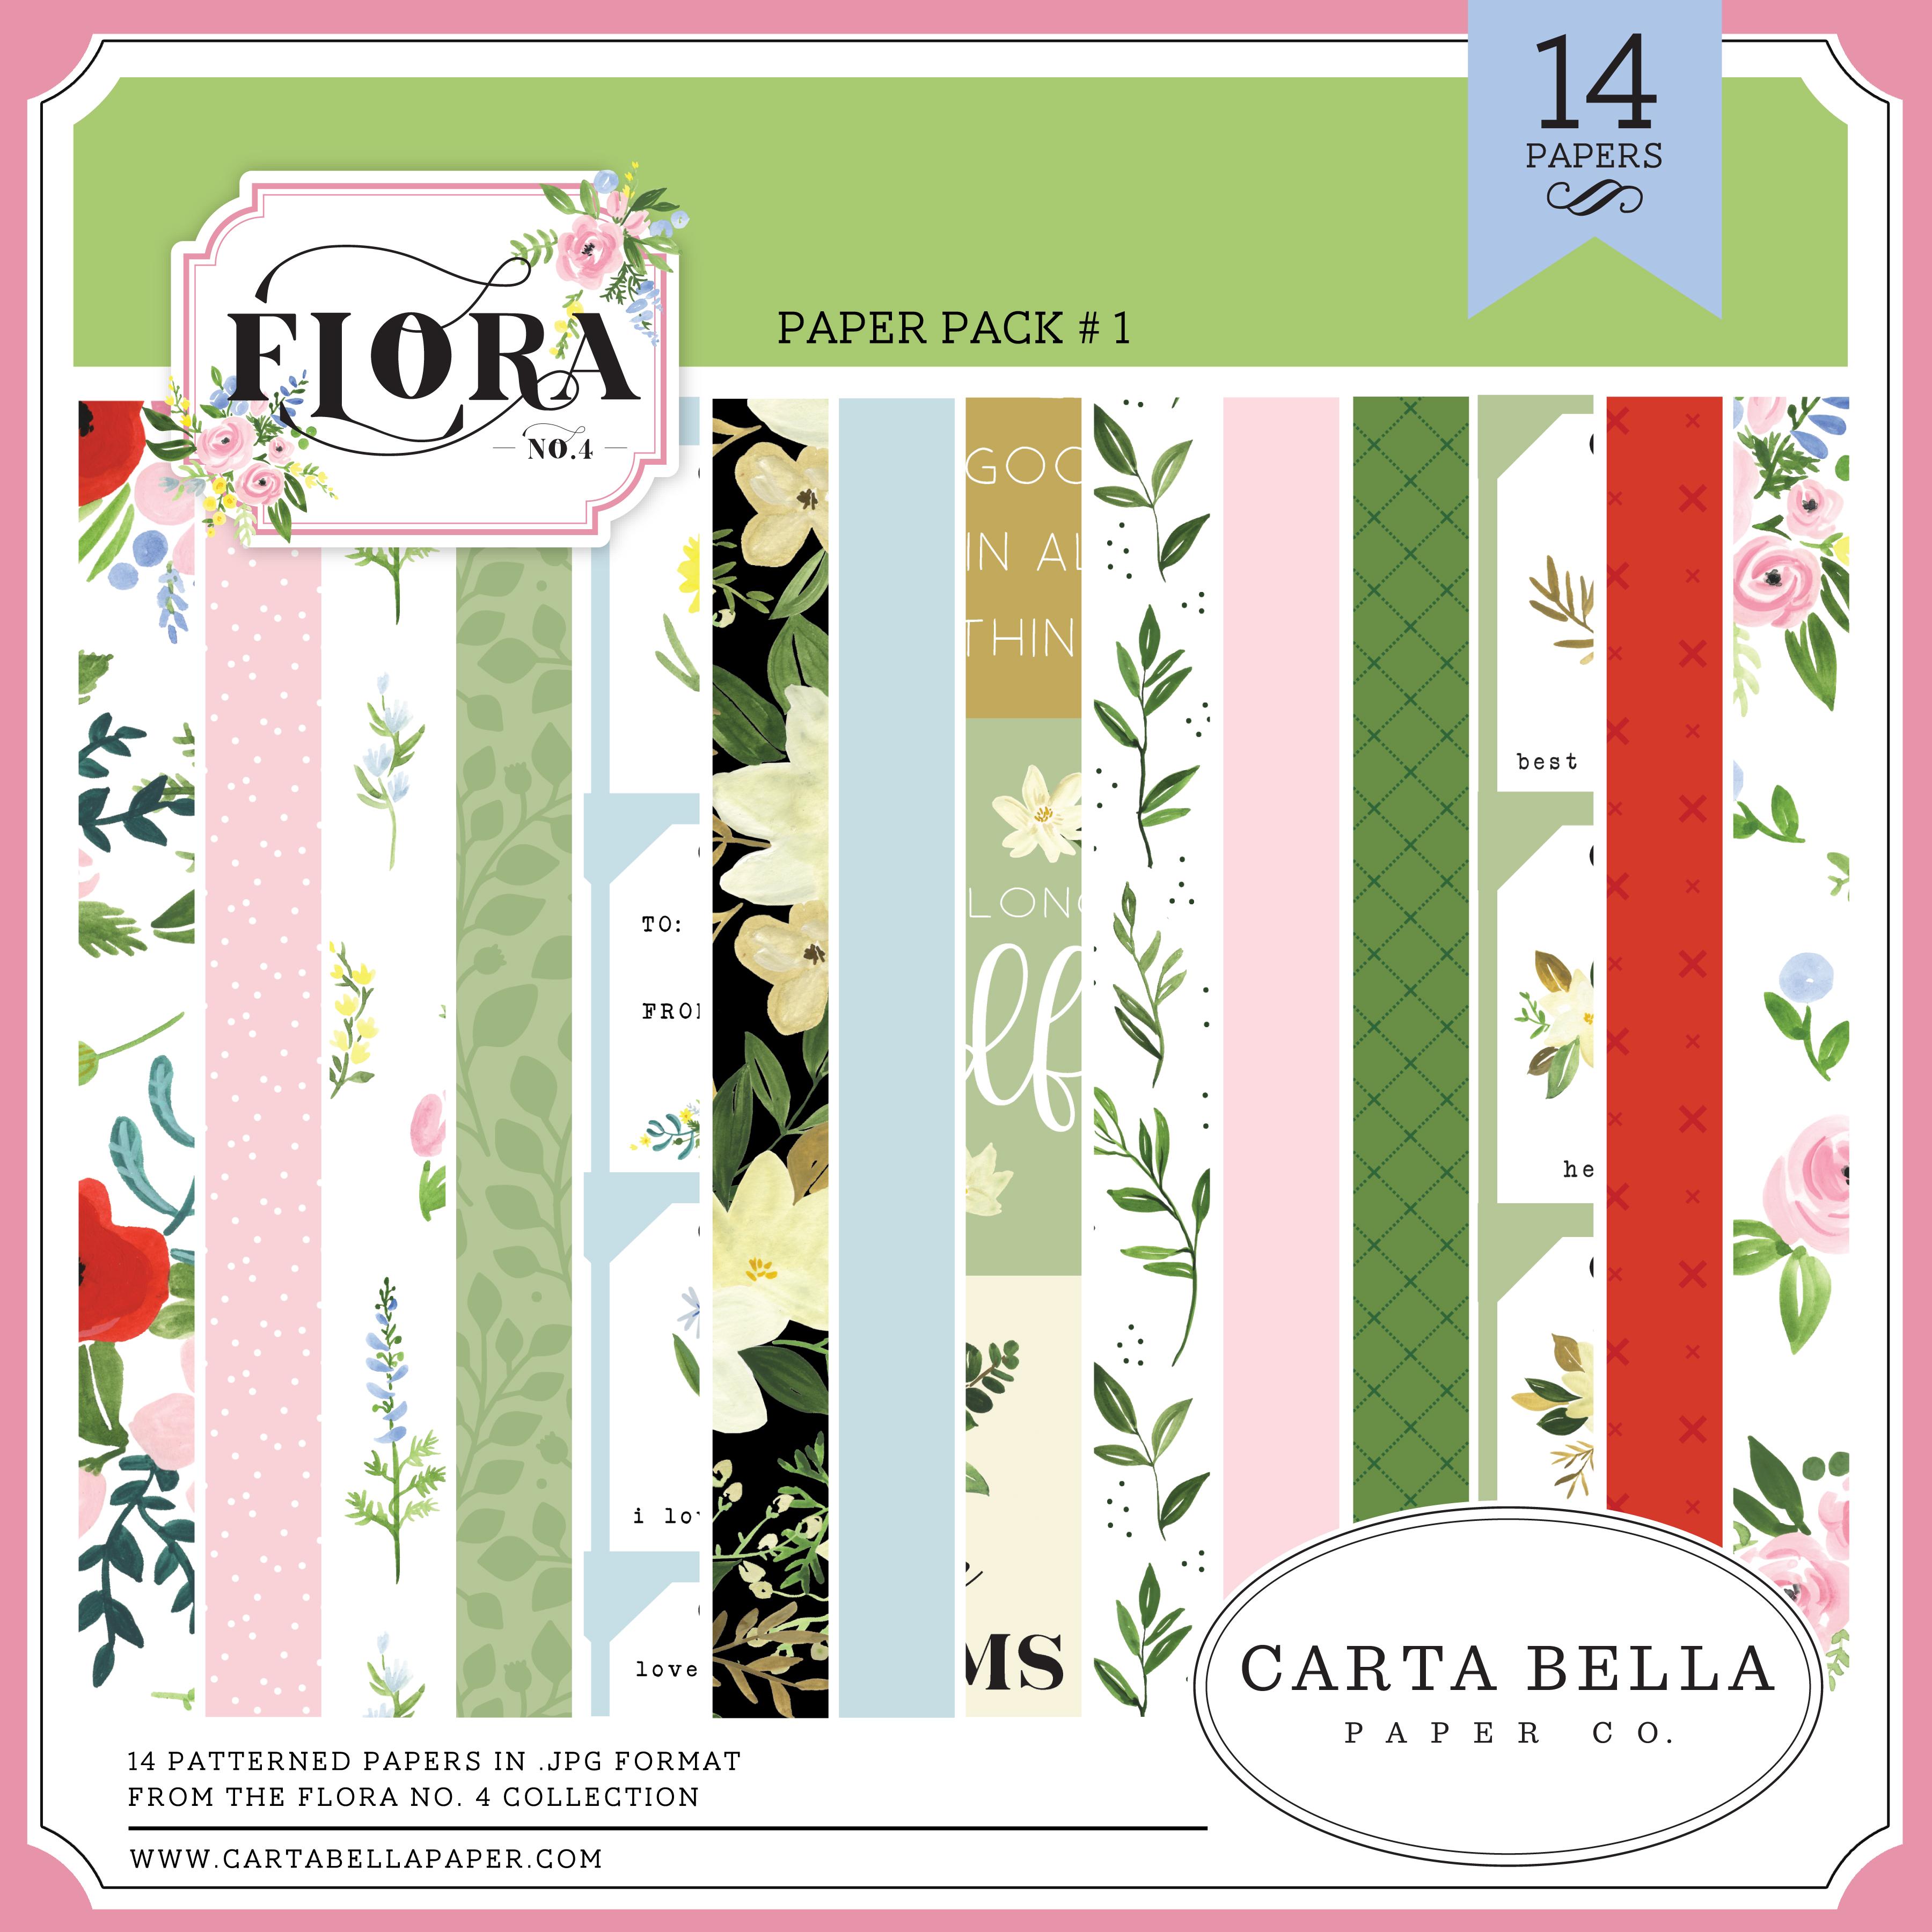 Flora No. 4 Paper Pack #1